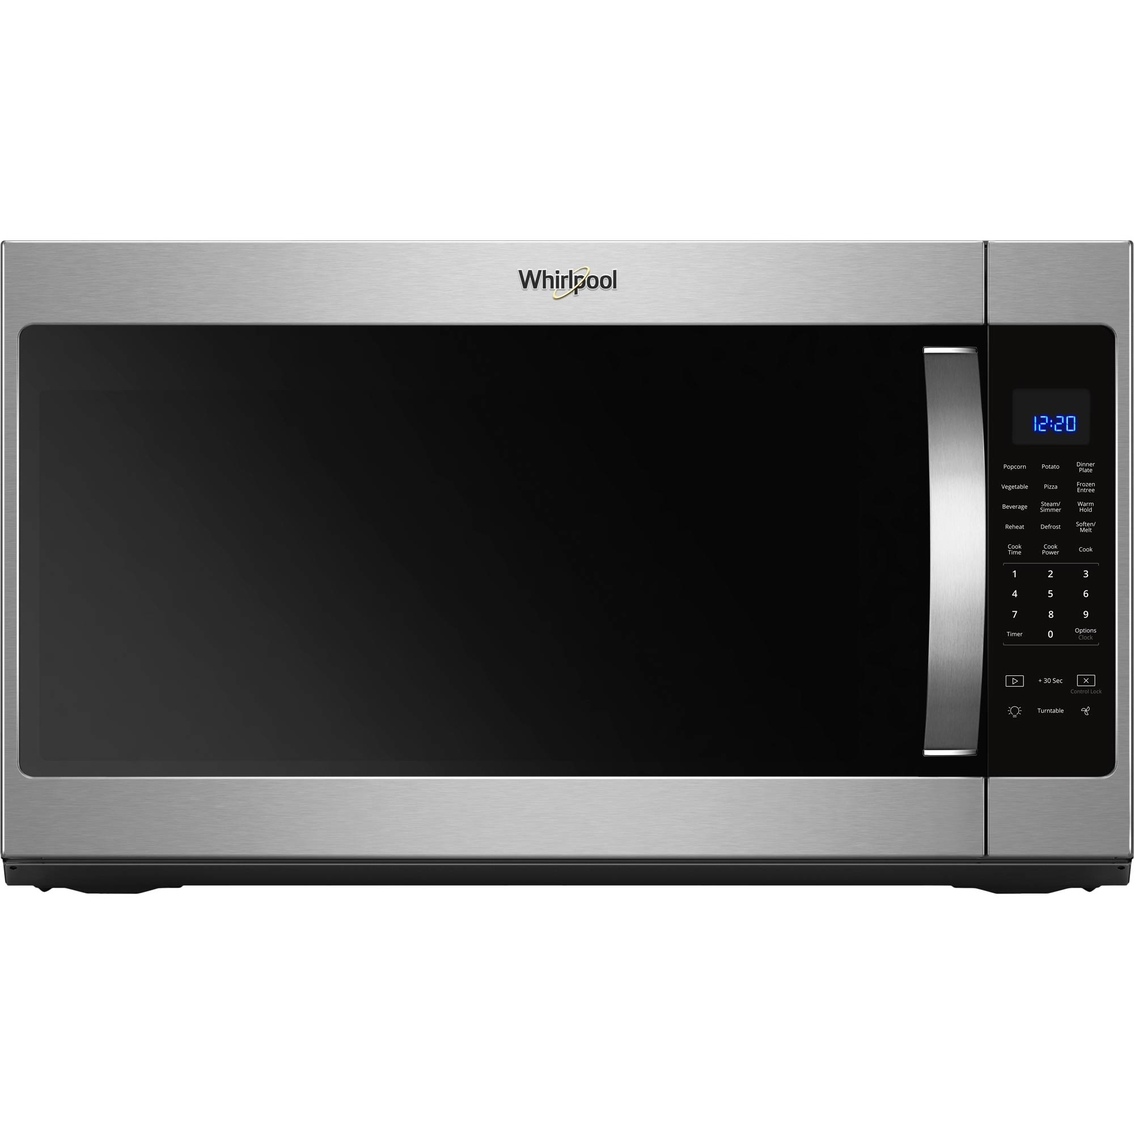 Whirlpool 2 1 Cu Ft Over The Range Microwave Hood Combination